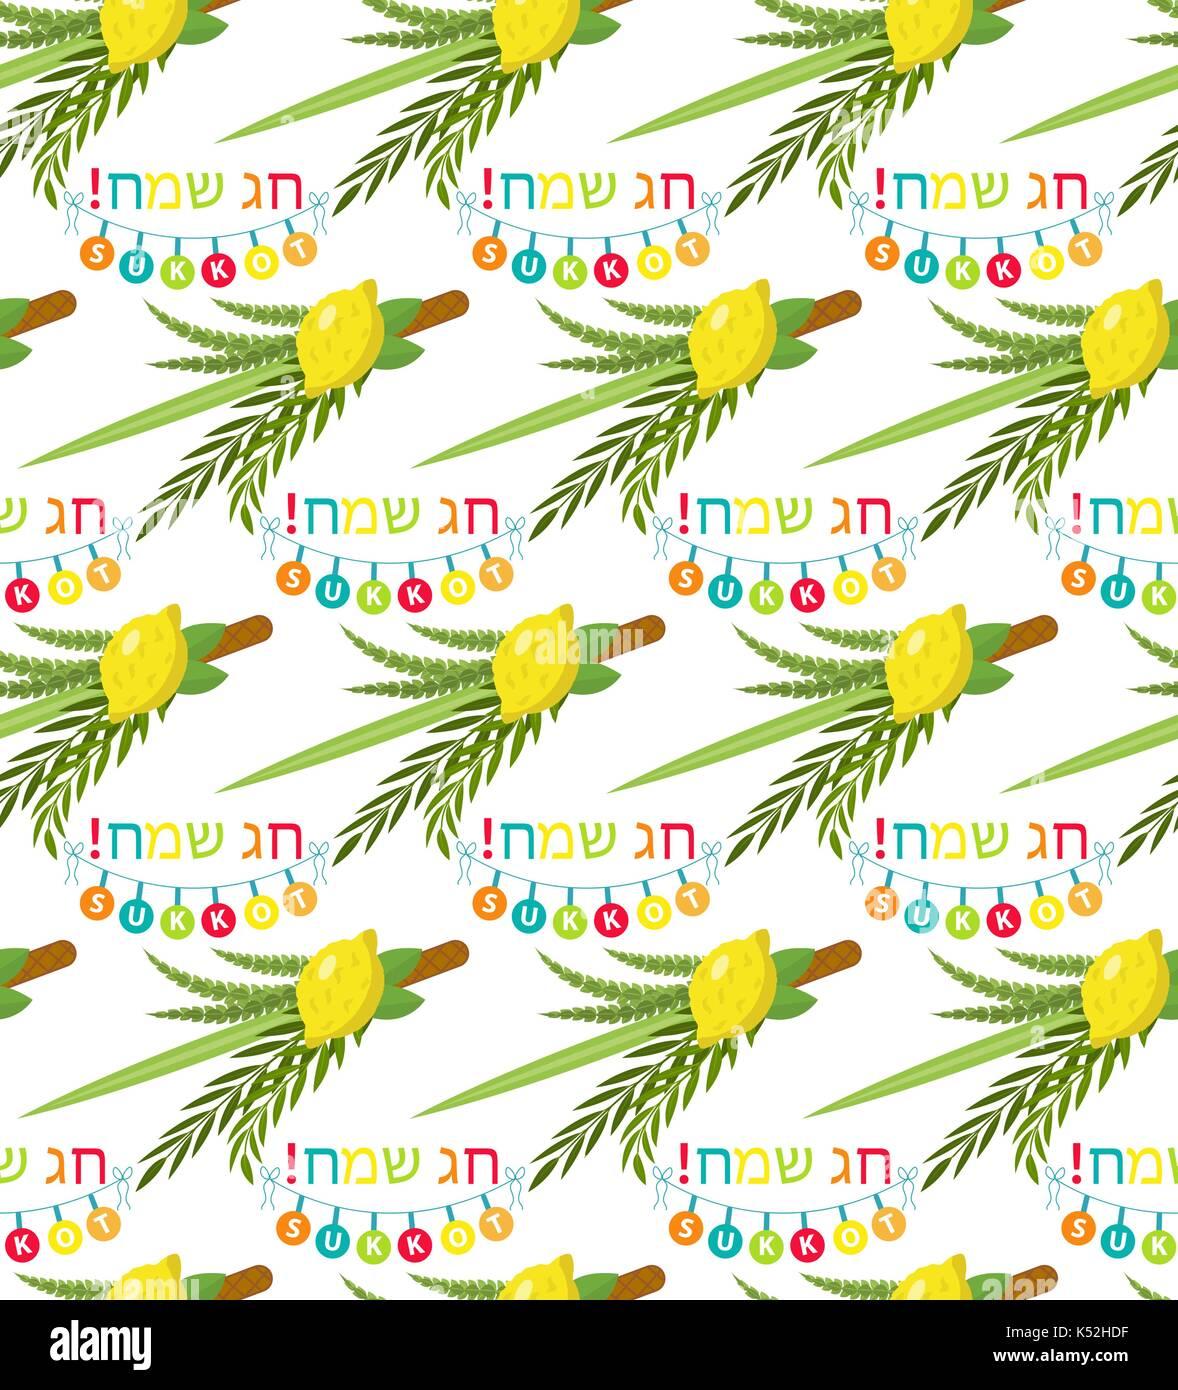 Happy Sukkot seamless pattern. Jewish holiday huts endless background. Repeating texture with etrog, lulav, Arava, Hadas. Vector illustration. - Stock Vector